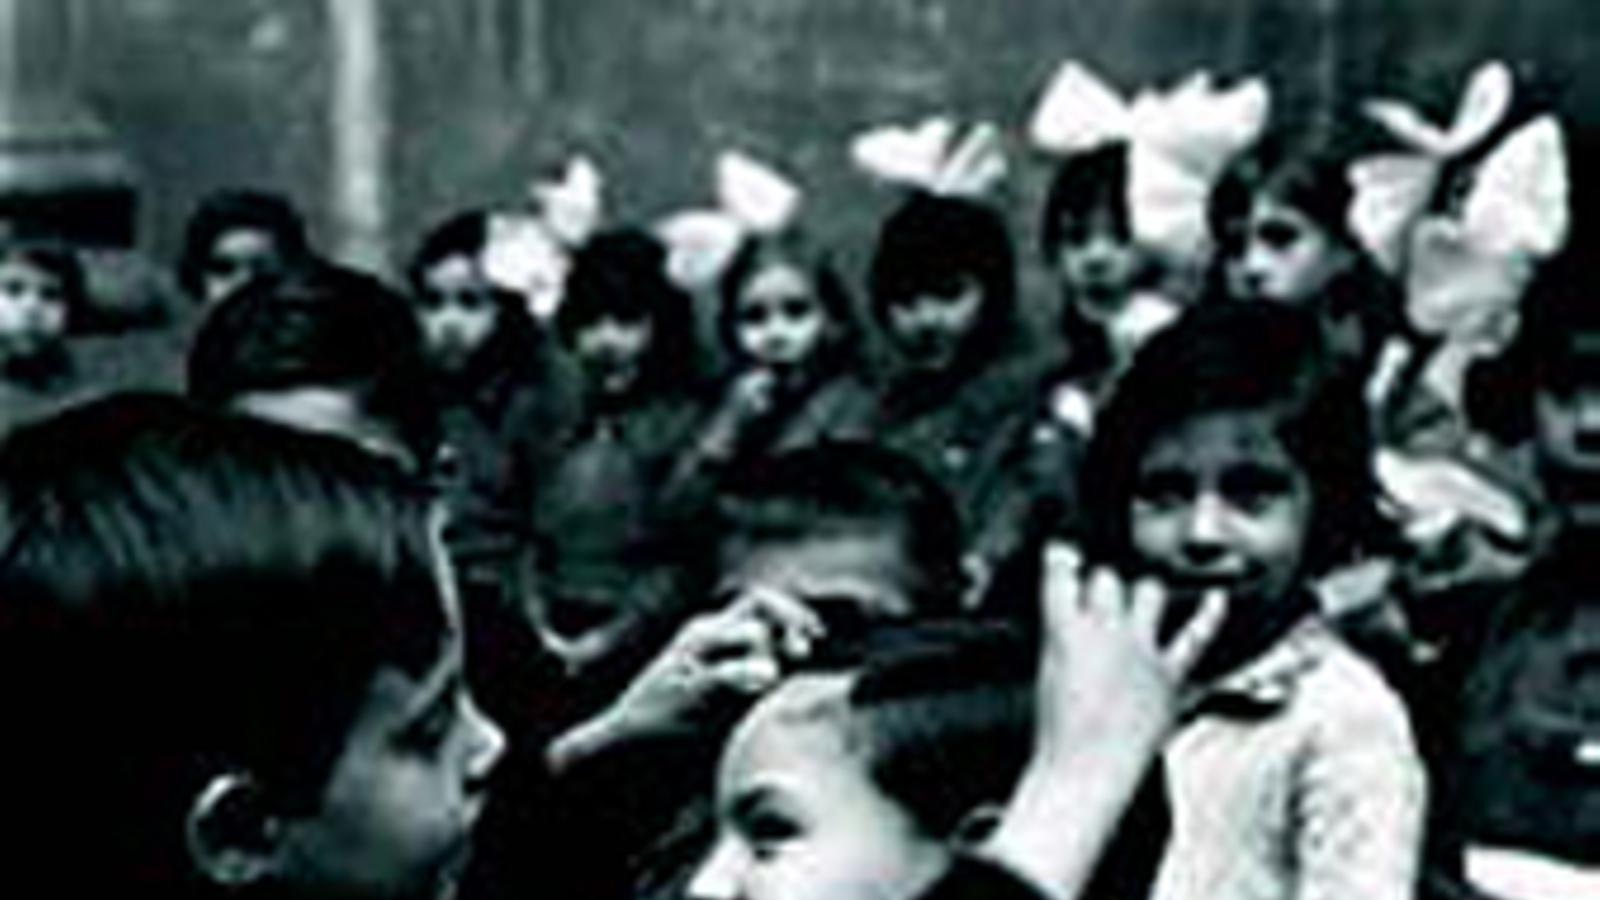 Refugiats a Sant Felip Neri el 1936 / ANC/FONS BRANGULÍ